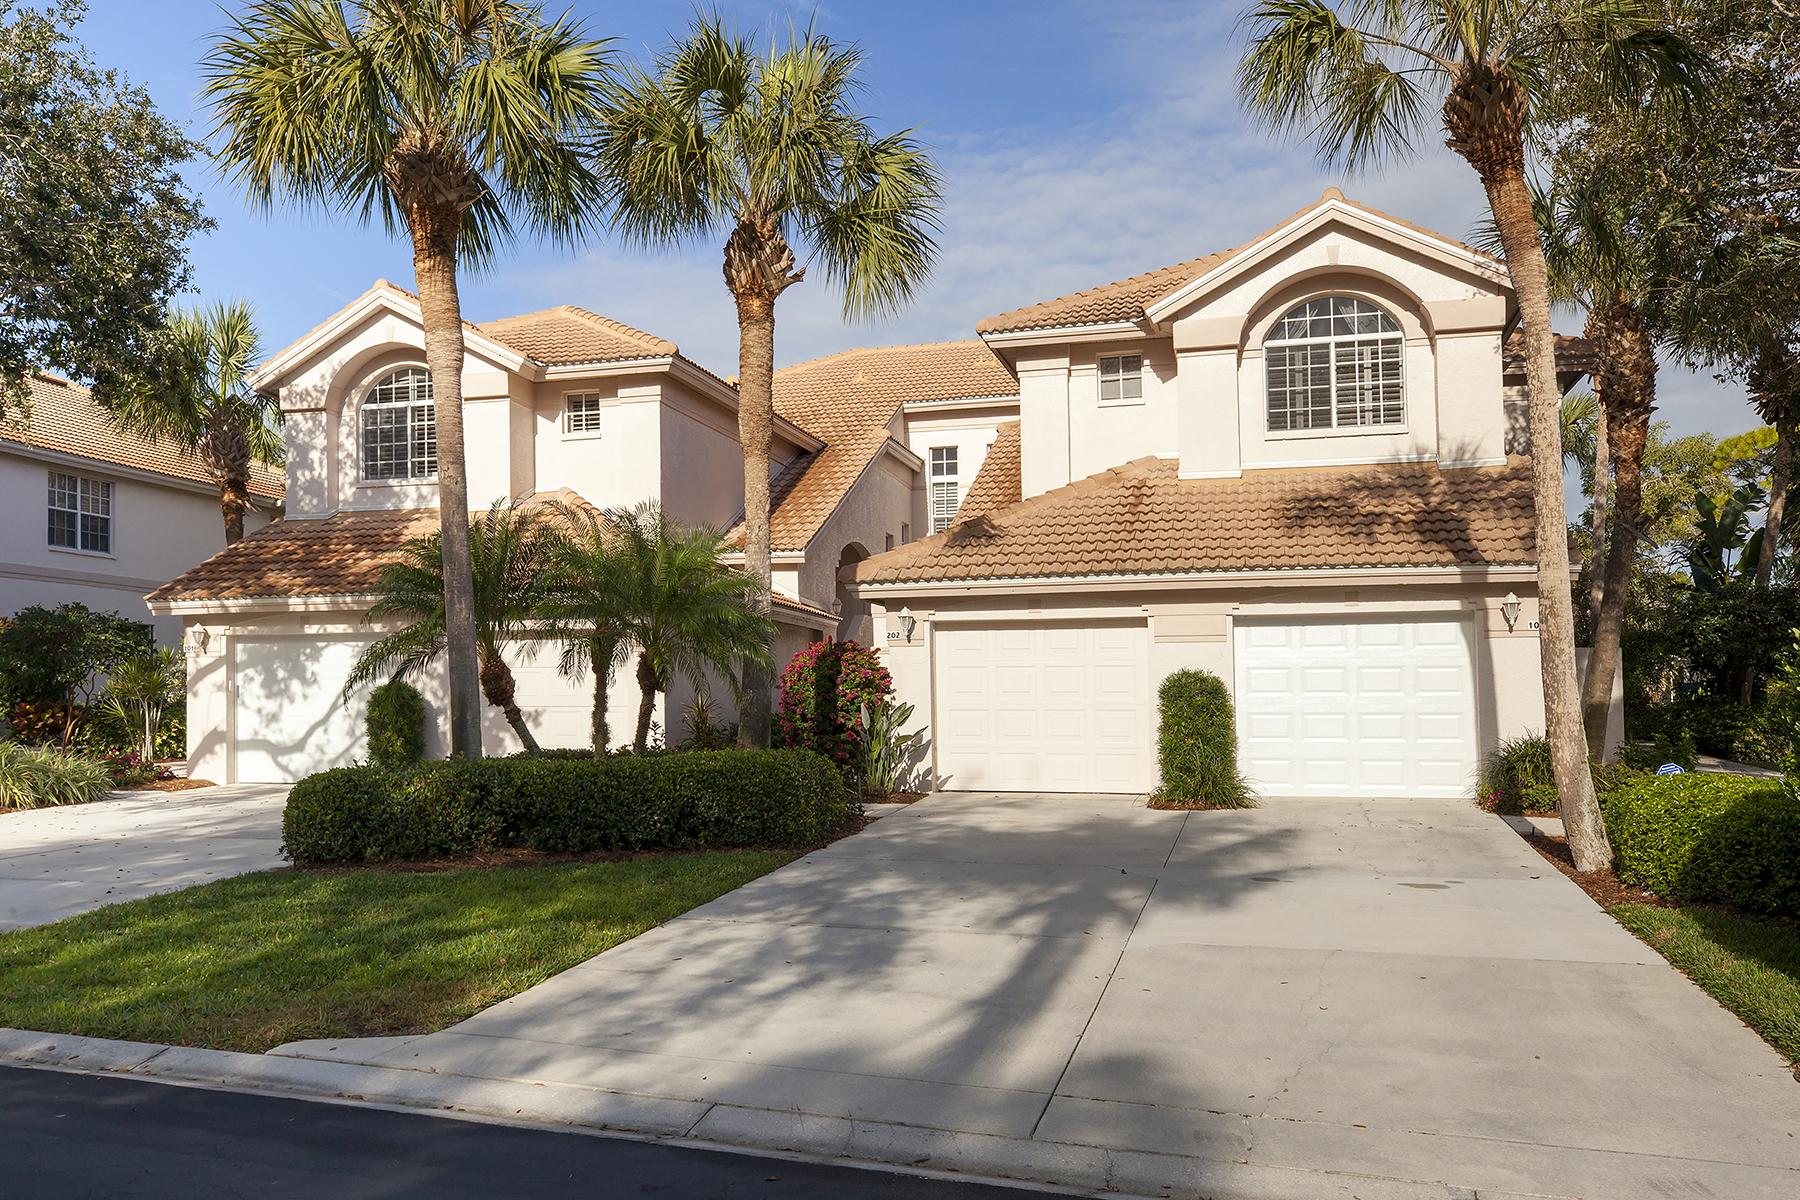 Condominium for Sale at BONITA BAY - HARBOR LANDING 4521 Riverwatch Dr 202, Bonita Springs, Florida 34134 United States